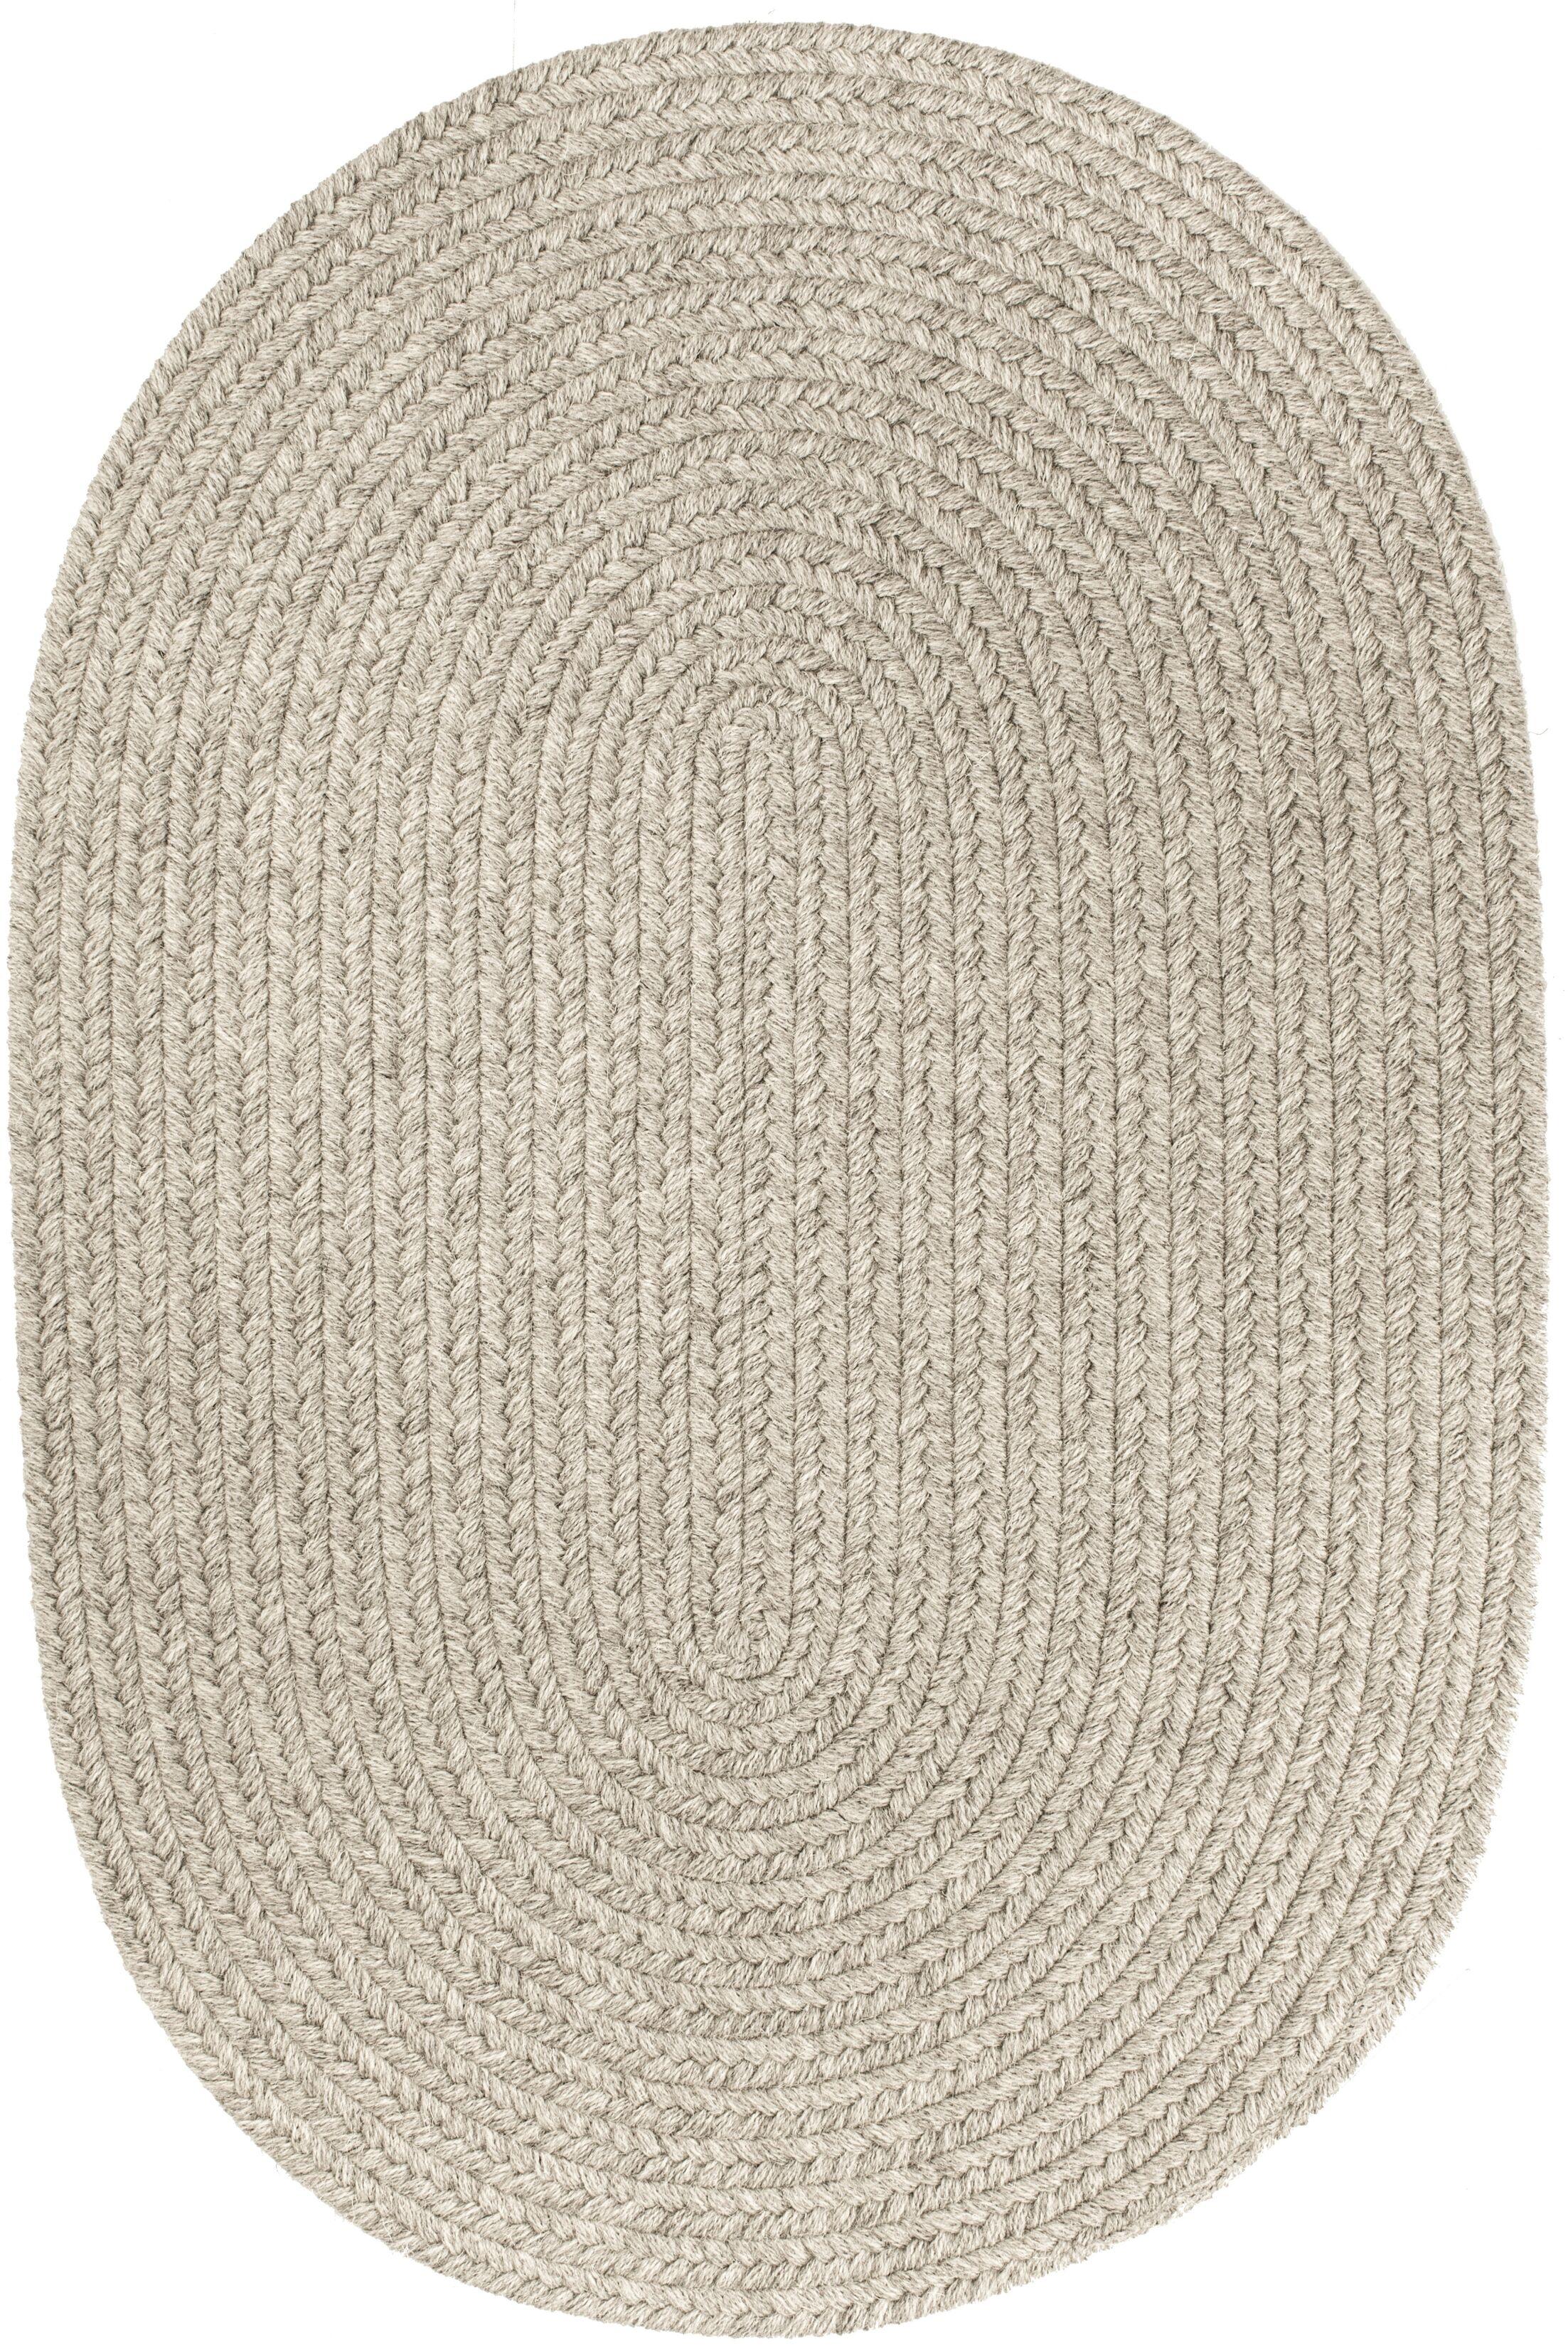 Handmade Light Gray Area Rug Rug Size: Oval 4' x 6'